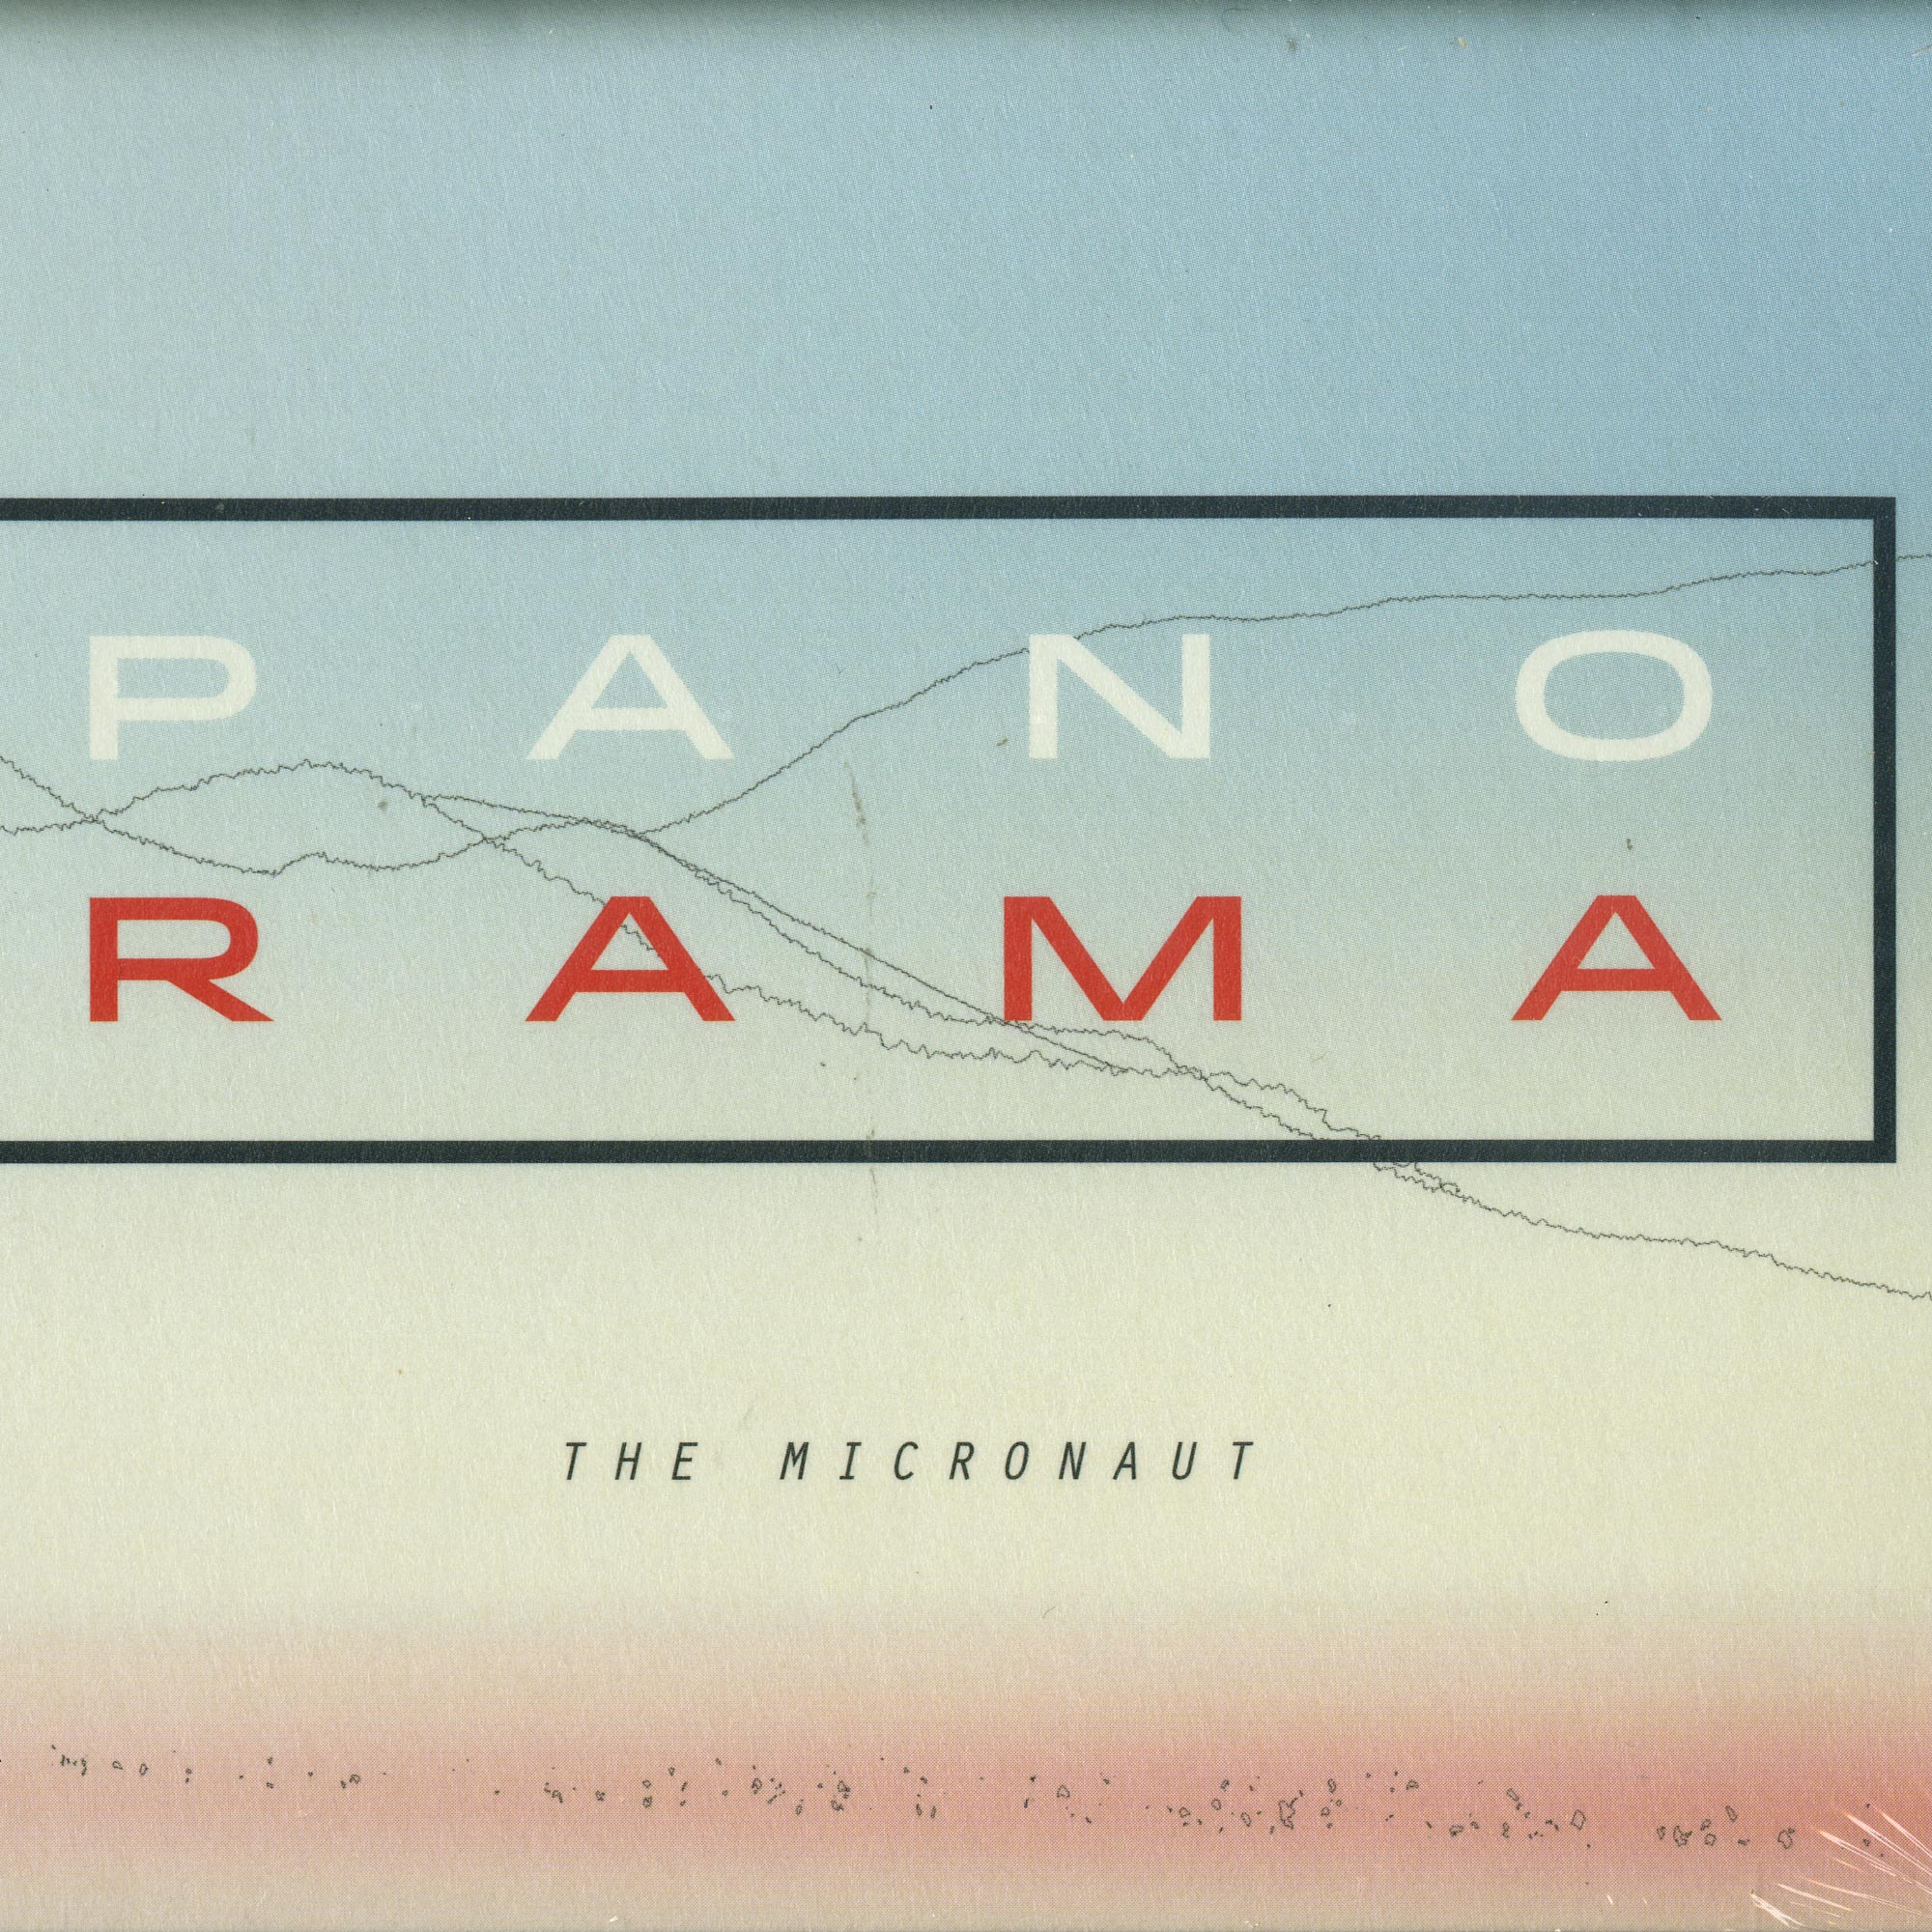 THE MICRONAUT - PANORAMA